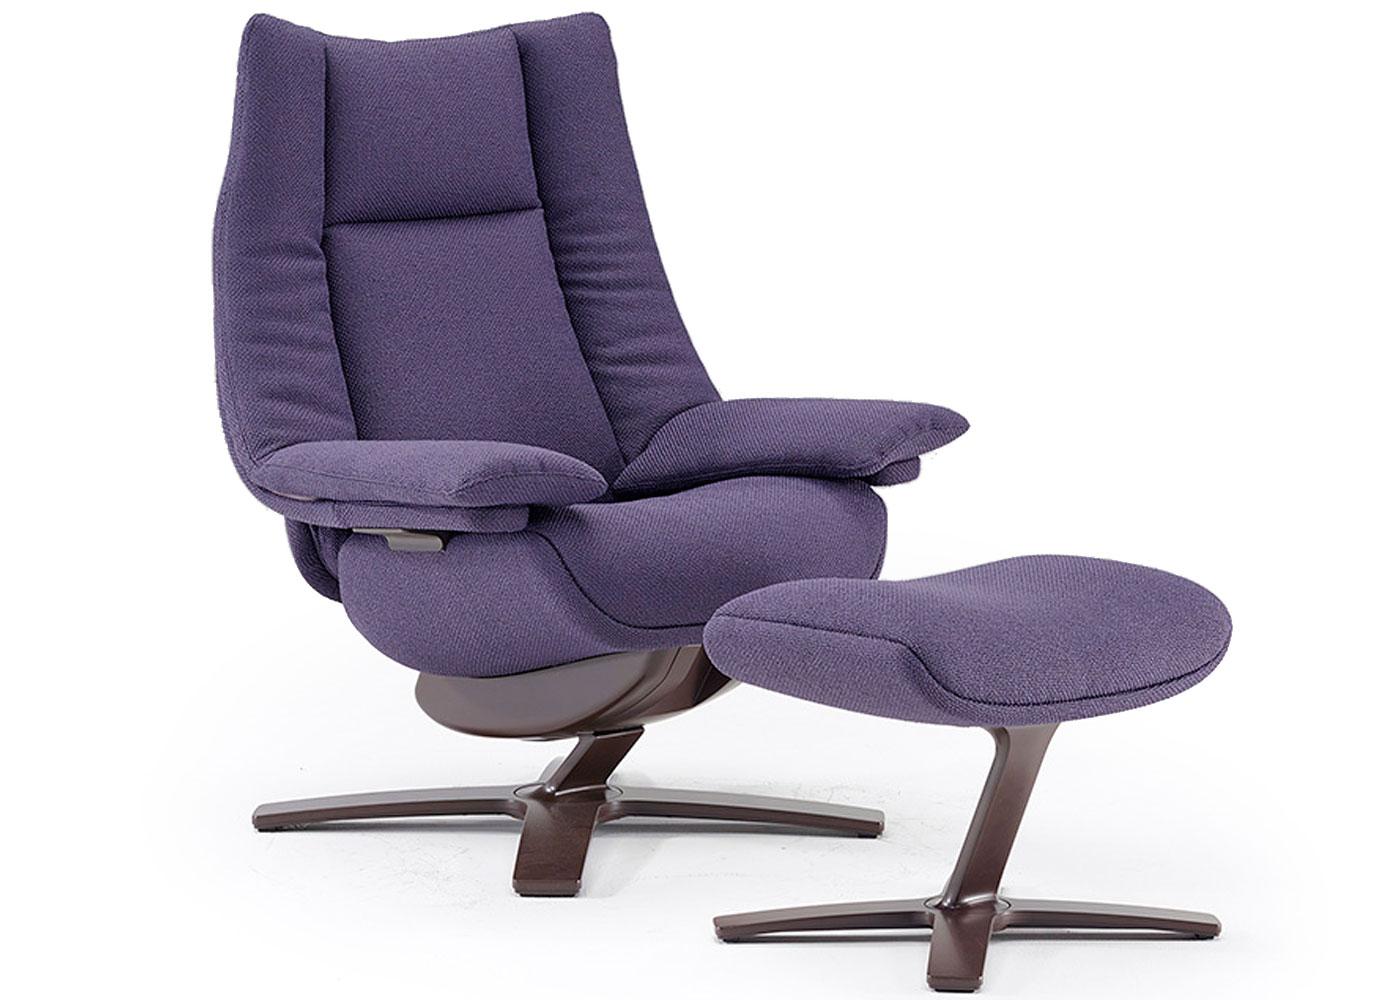 natuzzi revive chair ergonomic tilt re vive suit midfurn furniture superstore